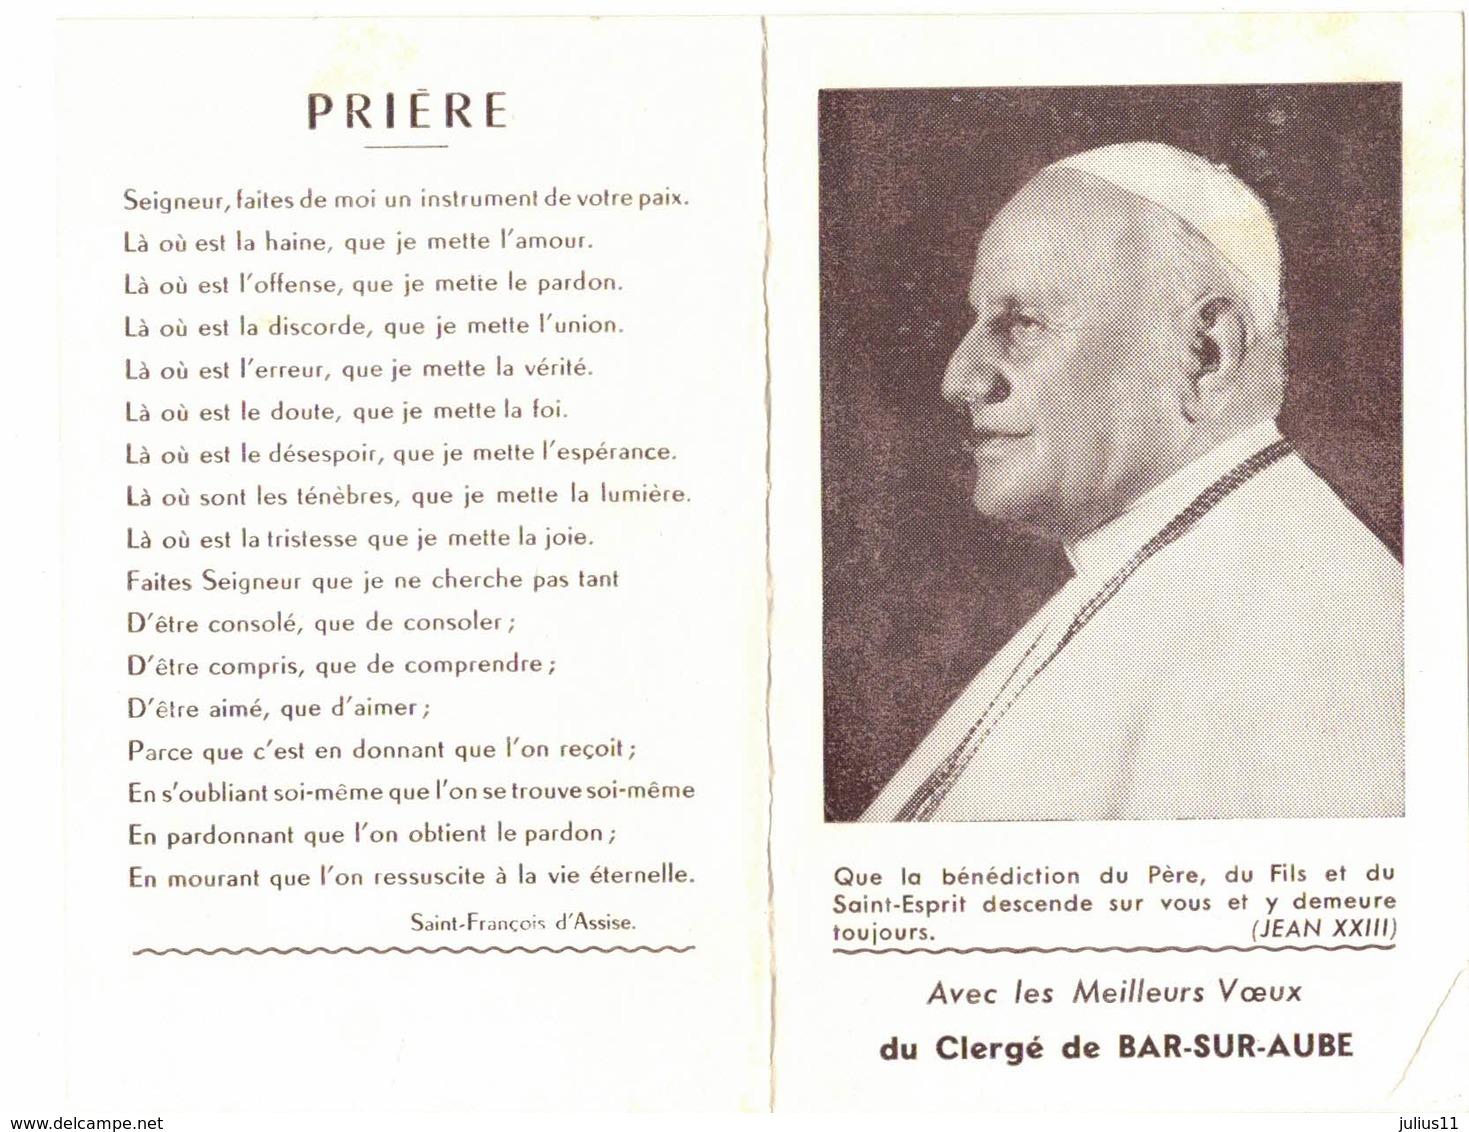 TROYES CALENDRIER ALMANACH 1961 JEAN XXIII BAR SUR AUBE IMAGE PIEUSE RELIGIEUSE HOLY CARD SANTINI HEILIG PRENTJE - Petit Format : 1961-70